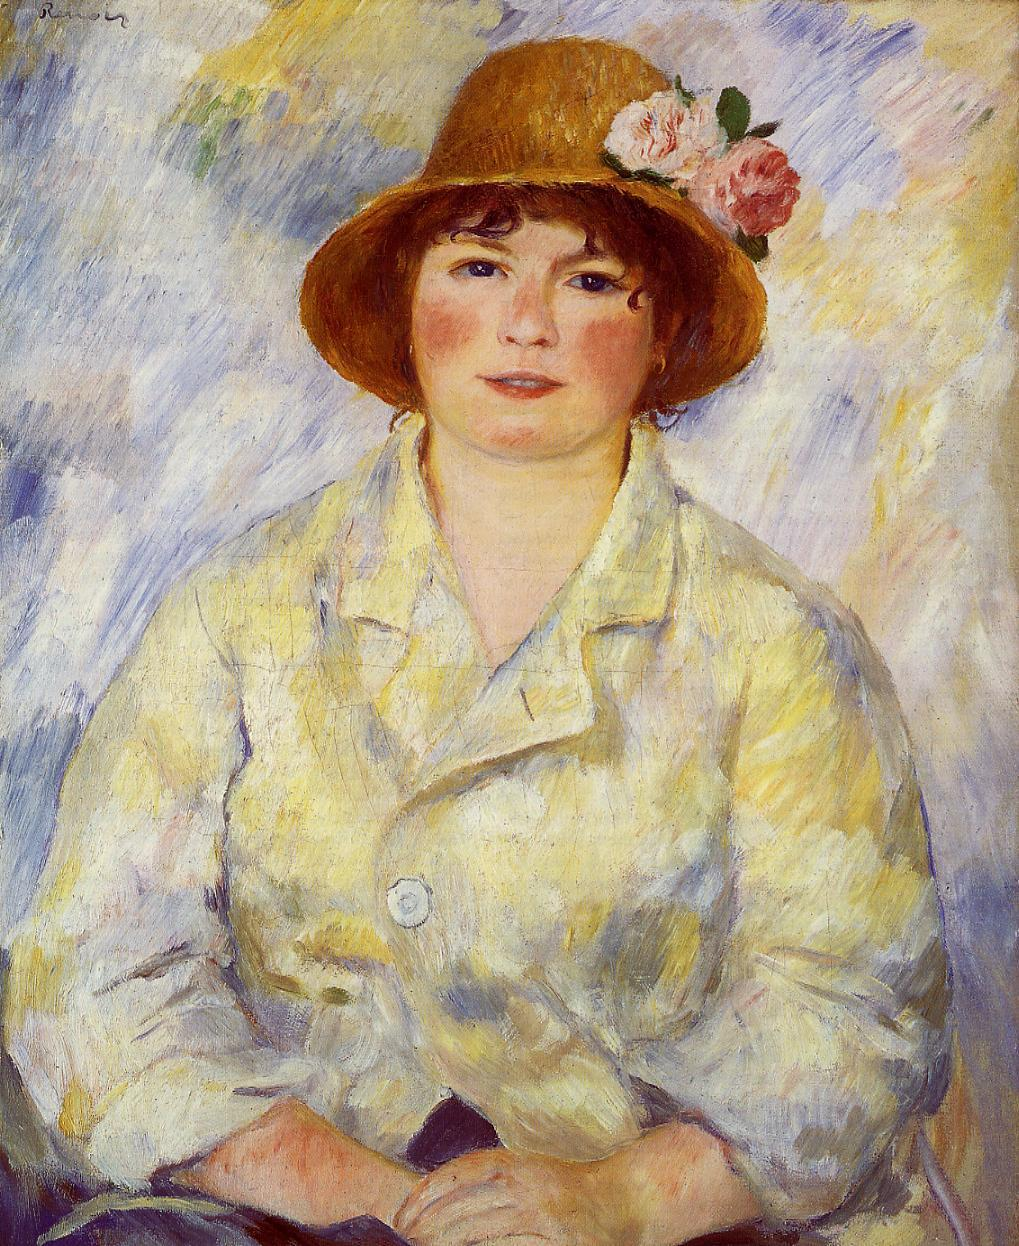 Aline Charigot (future Madame Renoir) 1885 | Pierre Auguste Renoir | Oil Painting